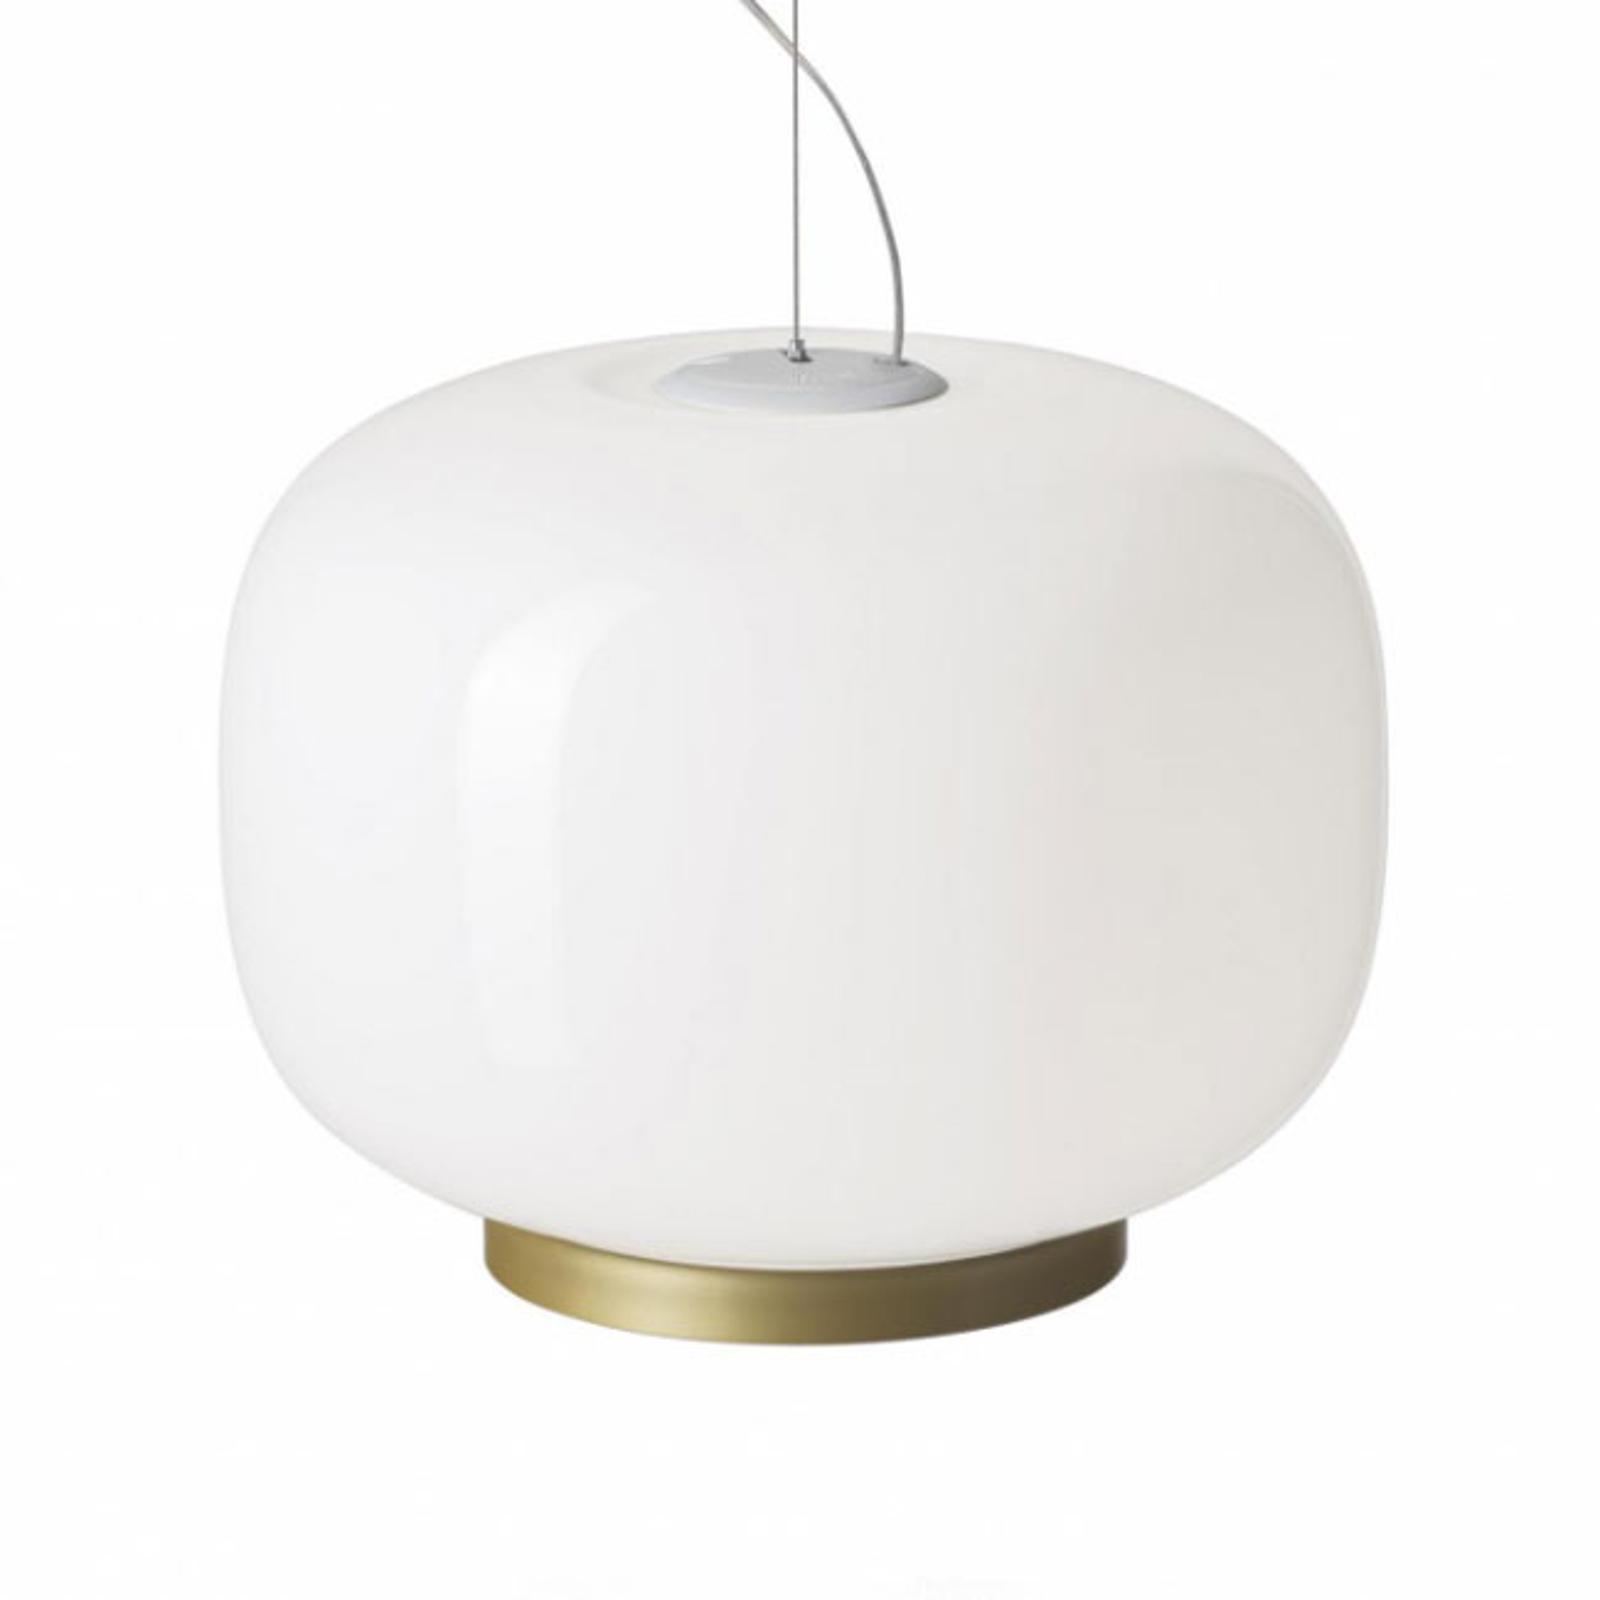 Foscarini Chouchin Reverse 1 LED gold/weiß on/off